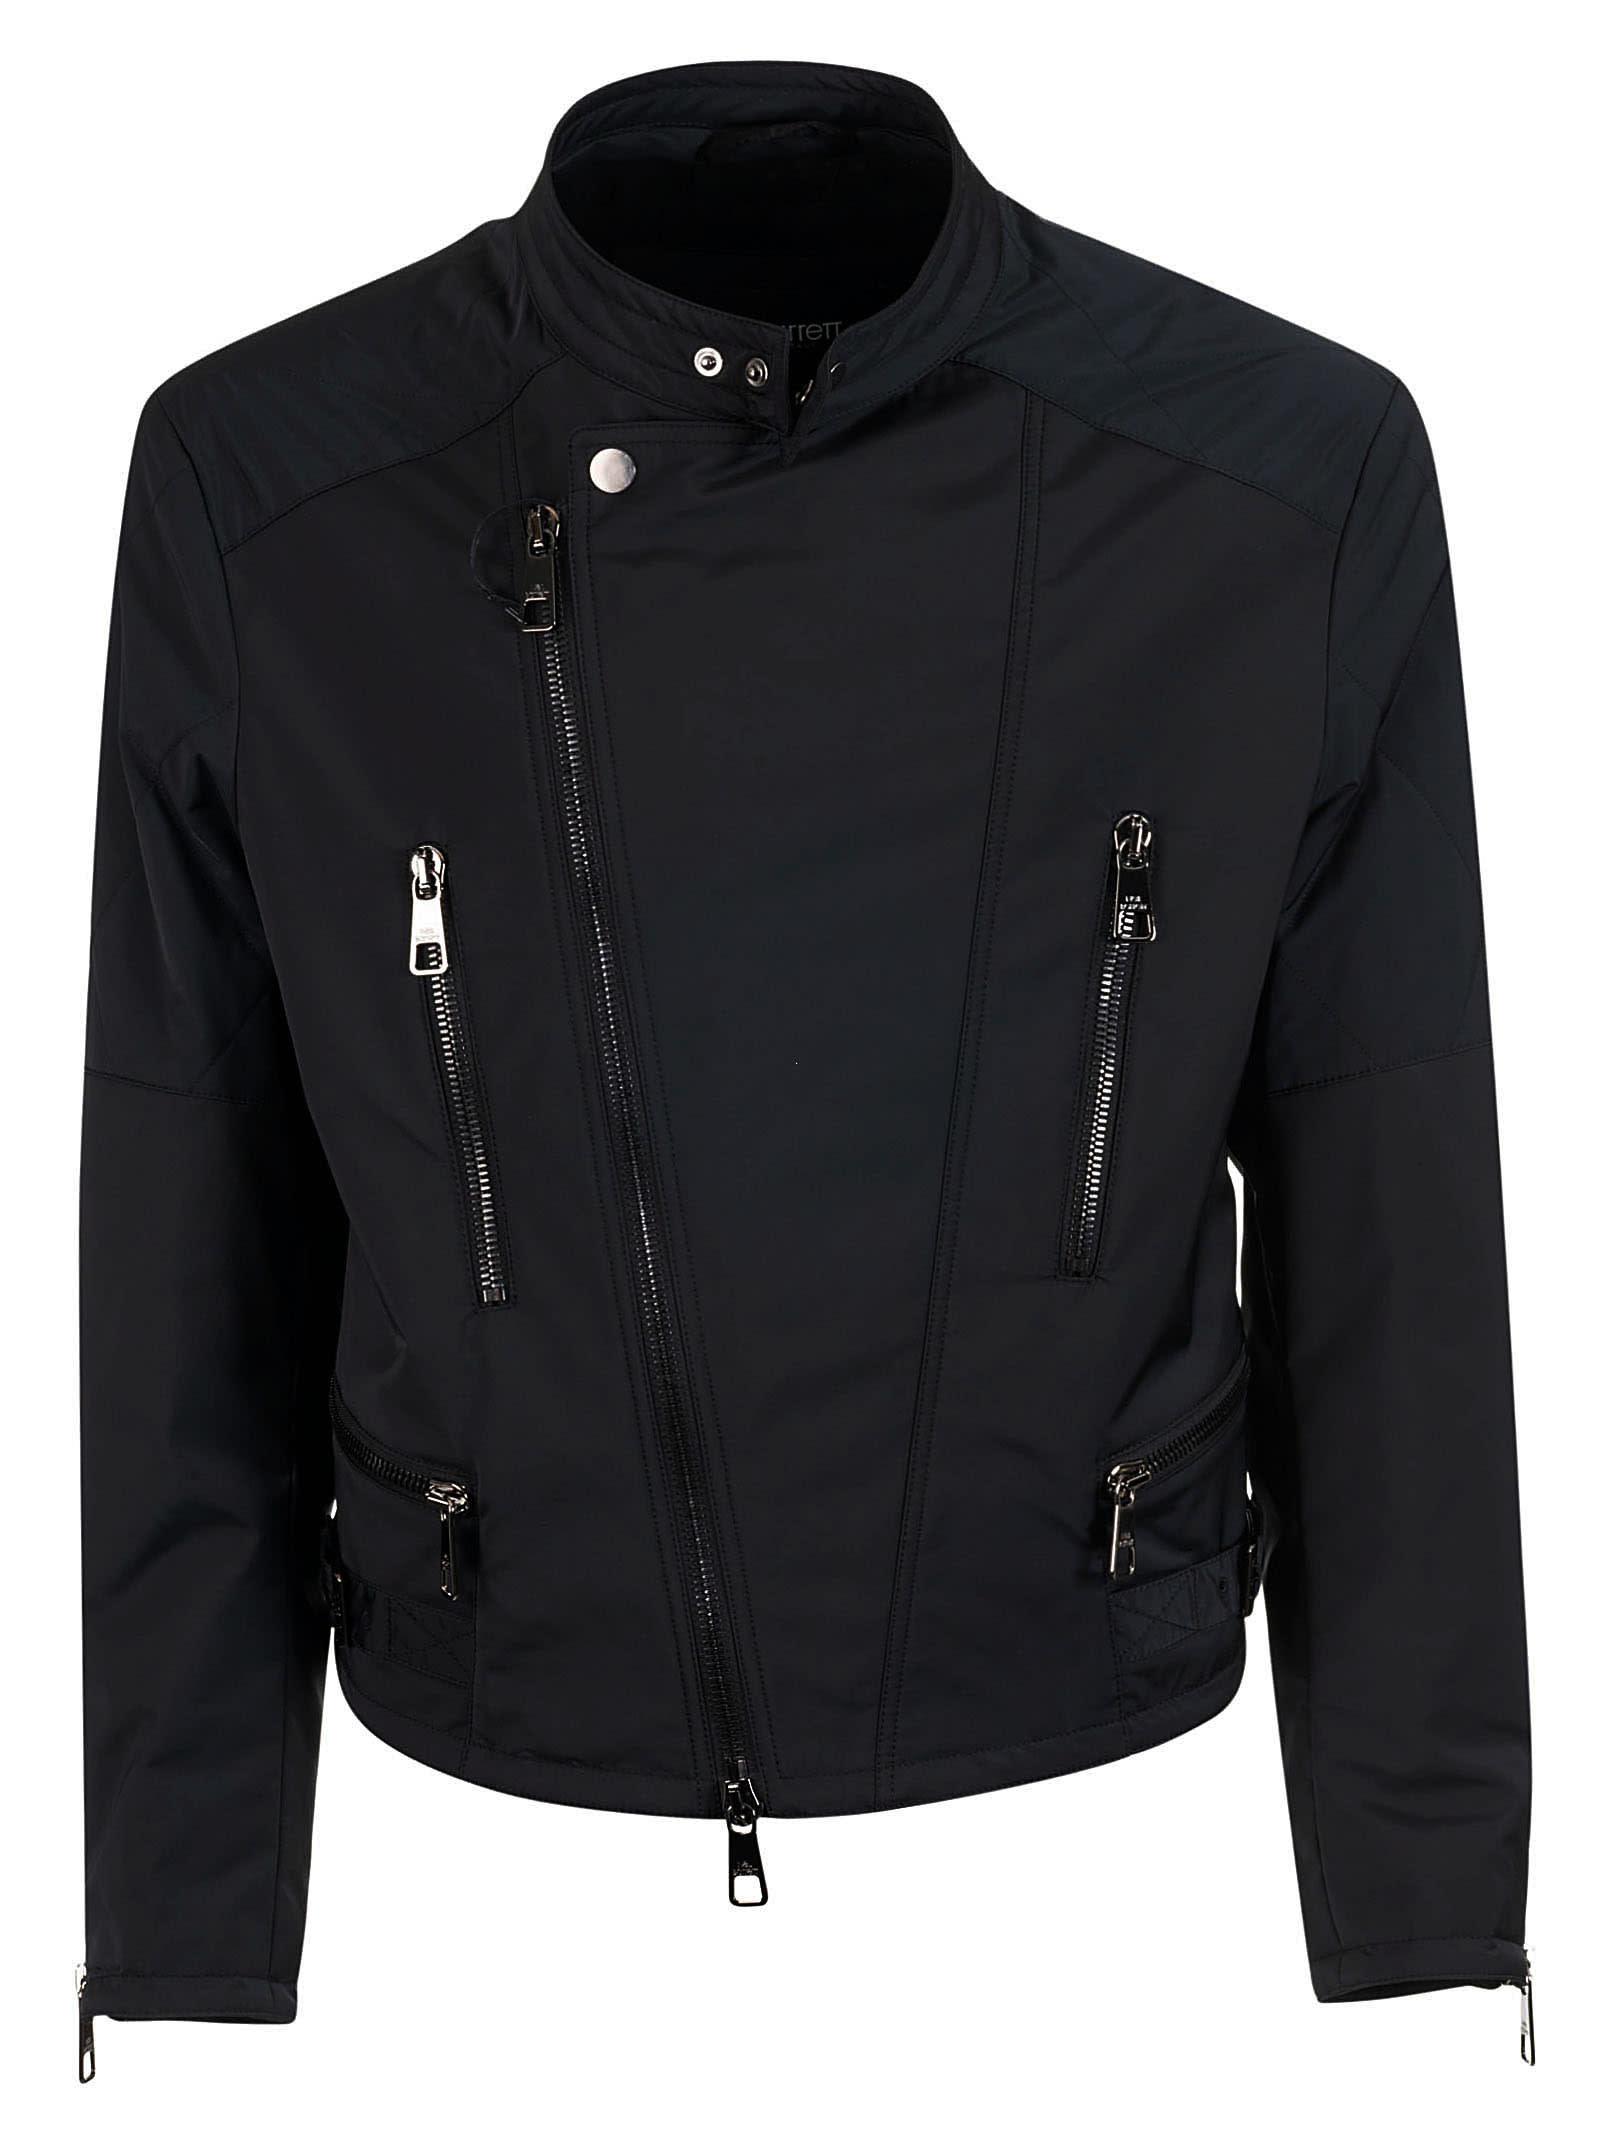 Neil Barrett Zipped Biker Jacket